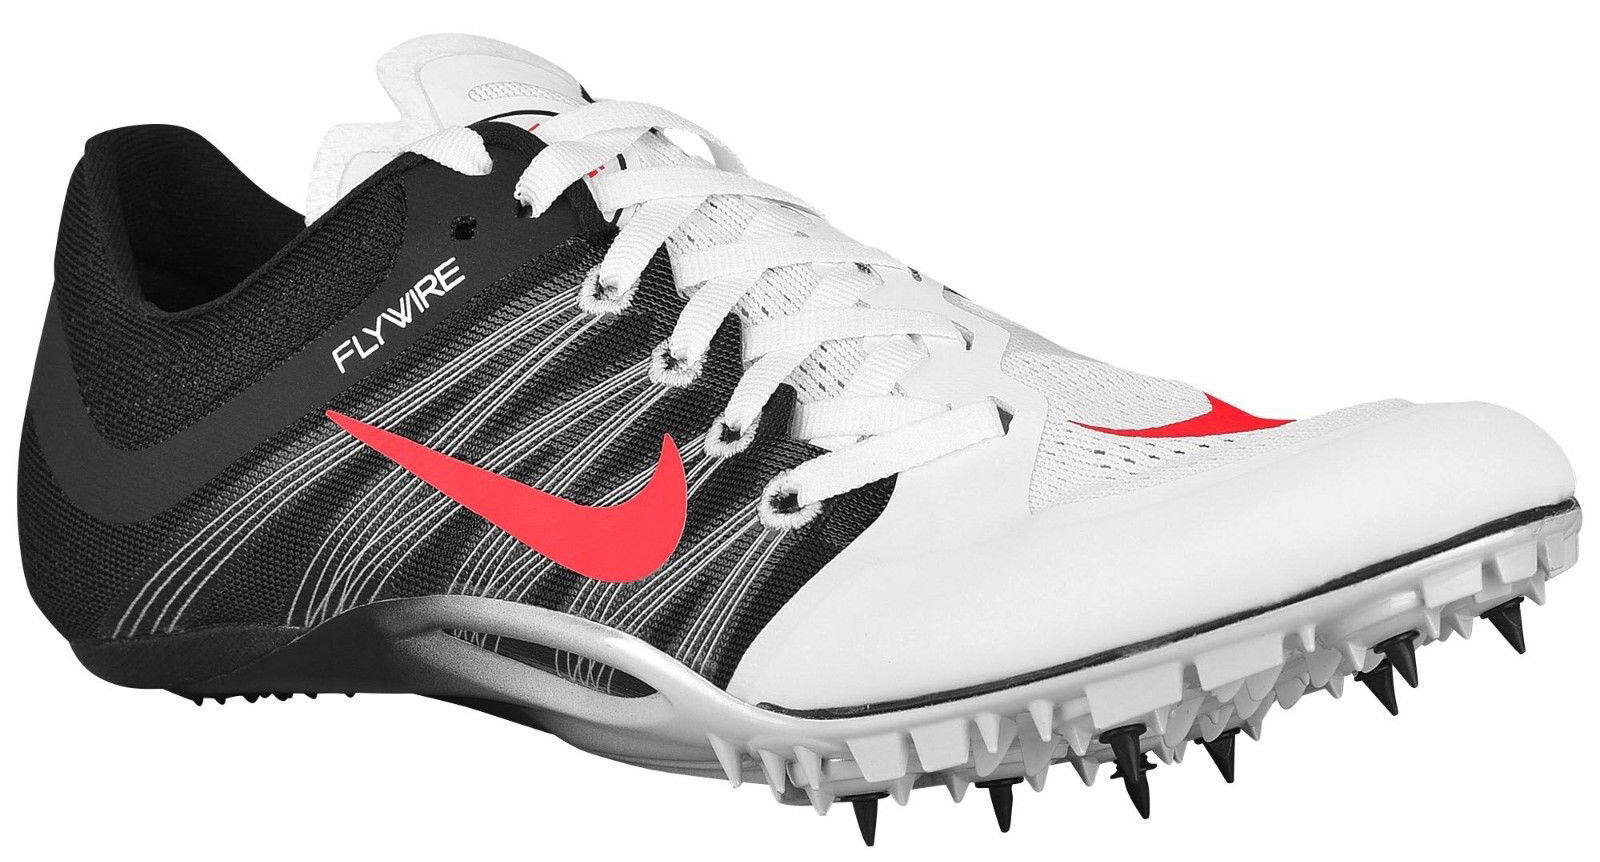 Sprinter Shoes Women